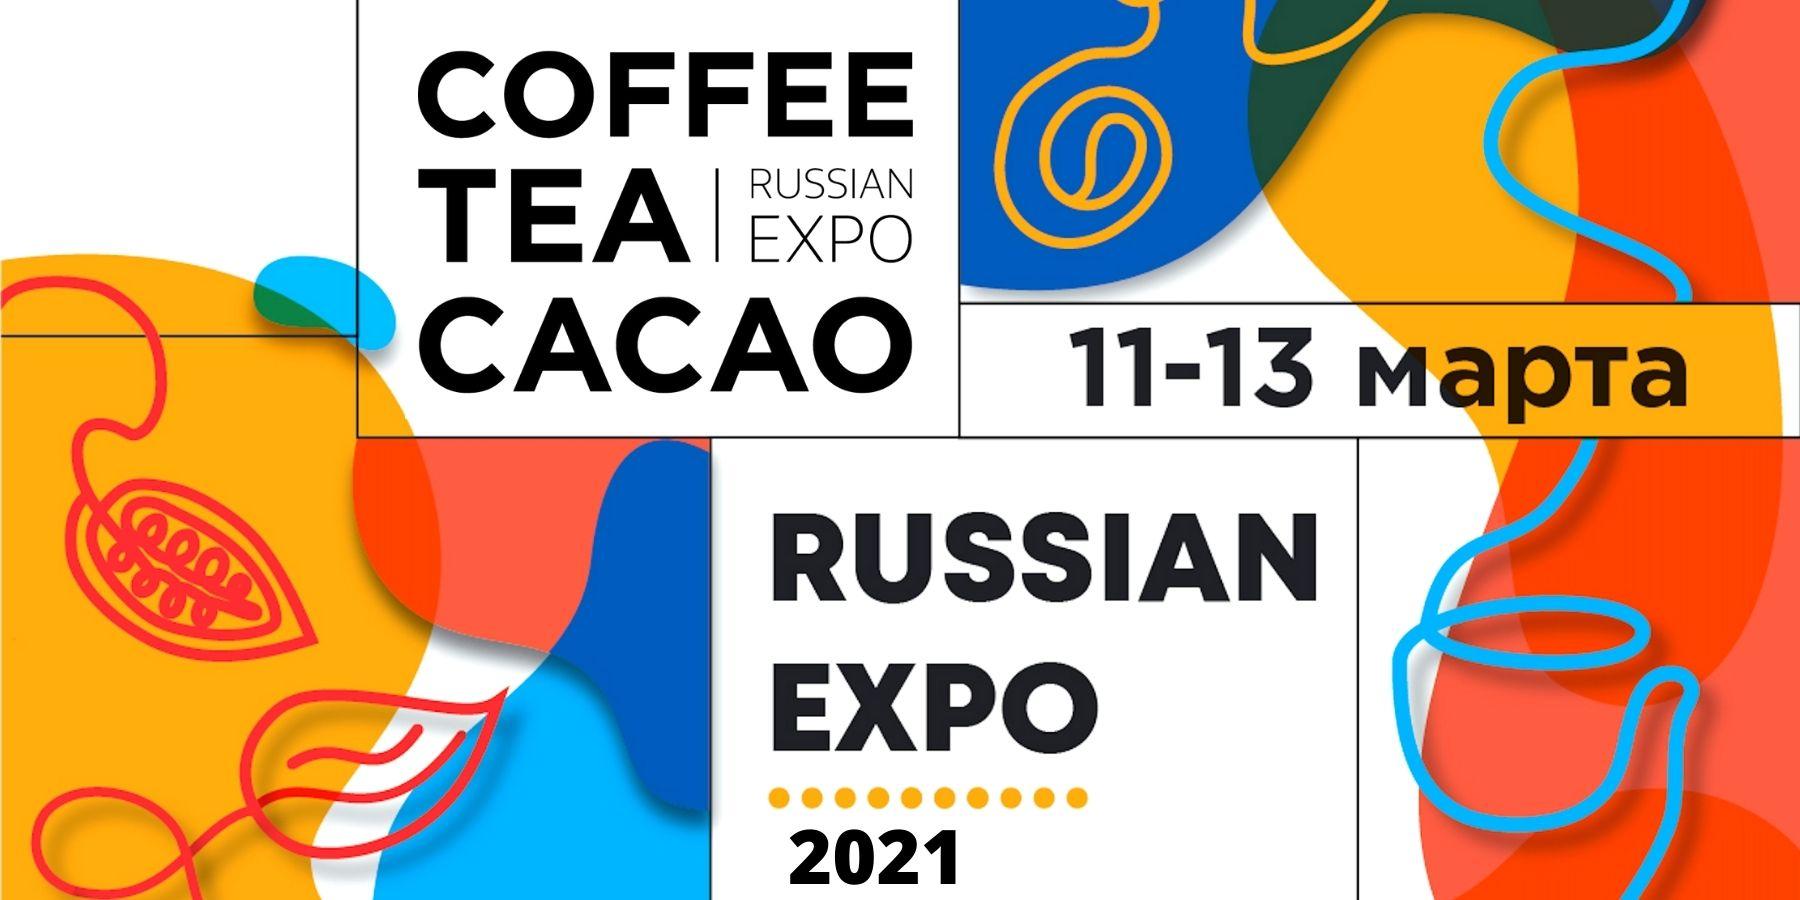 Coffee Tea Cacao Russian Expo 2021